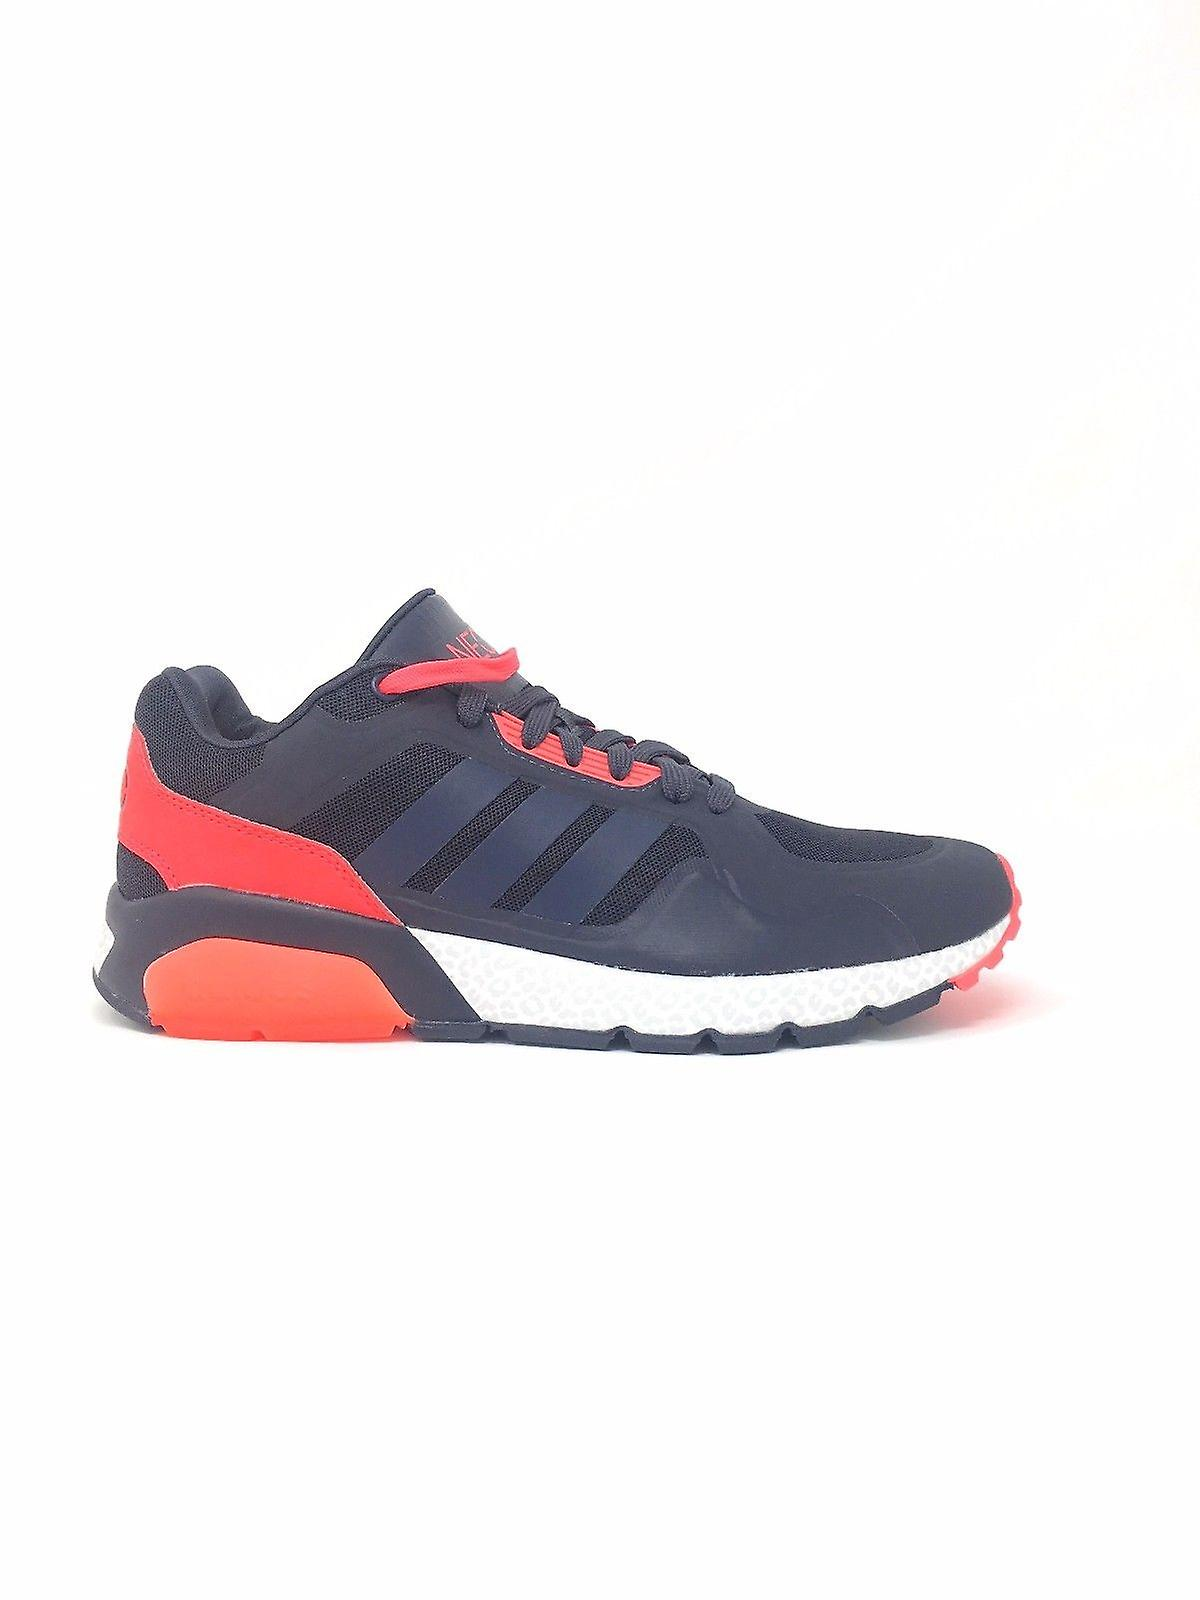 Adidas Neo Run 9Ties F76497 Mens Trainers